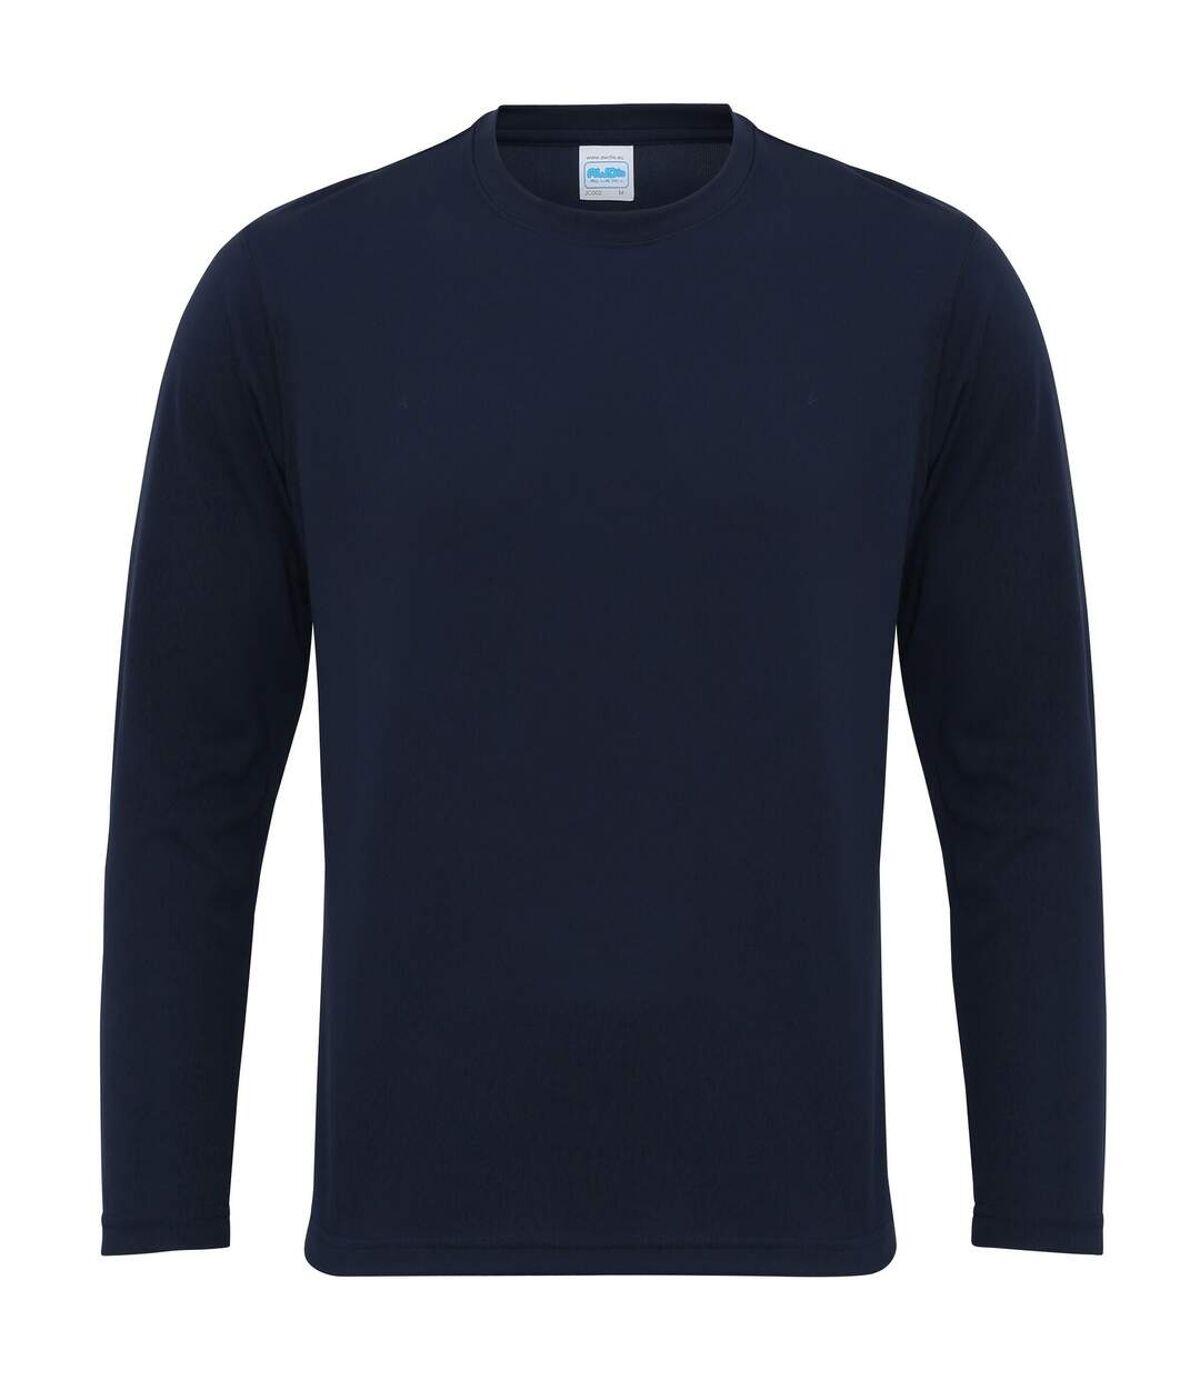 AWDis Just Cool Mens Long Sleeve Cool Sports Performance Plain T-Shirt (Arctic White) - UTRW684